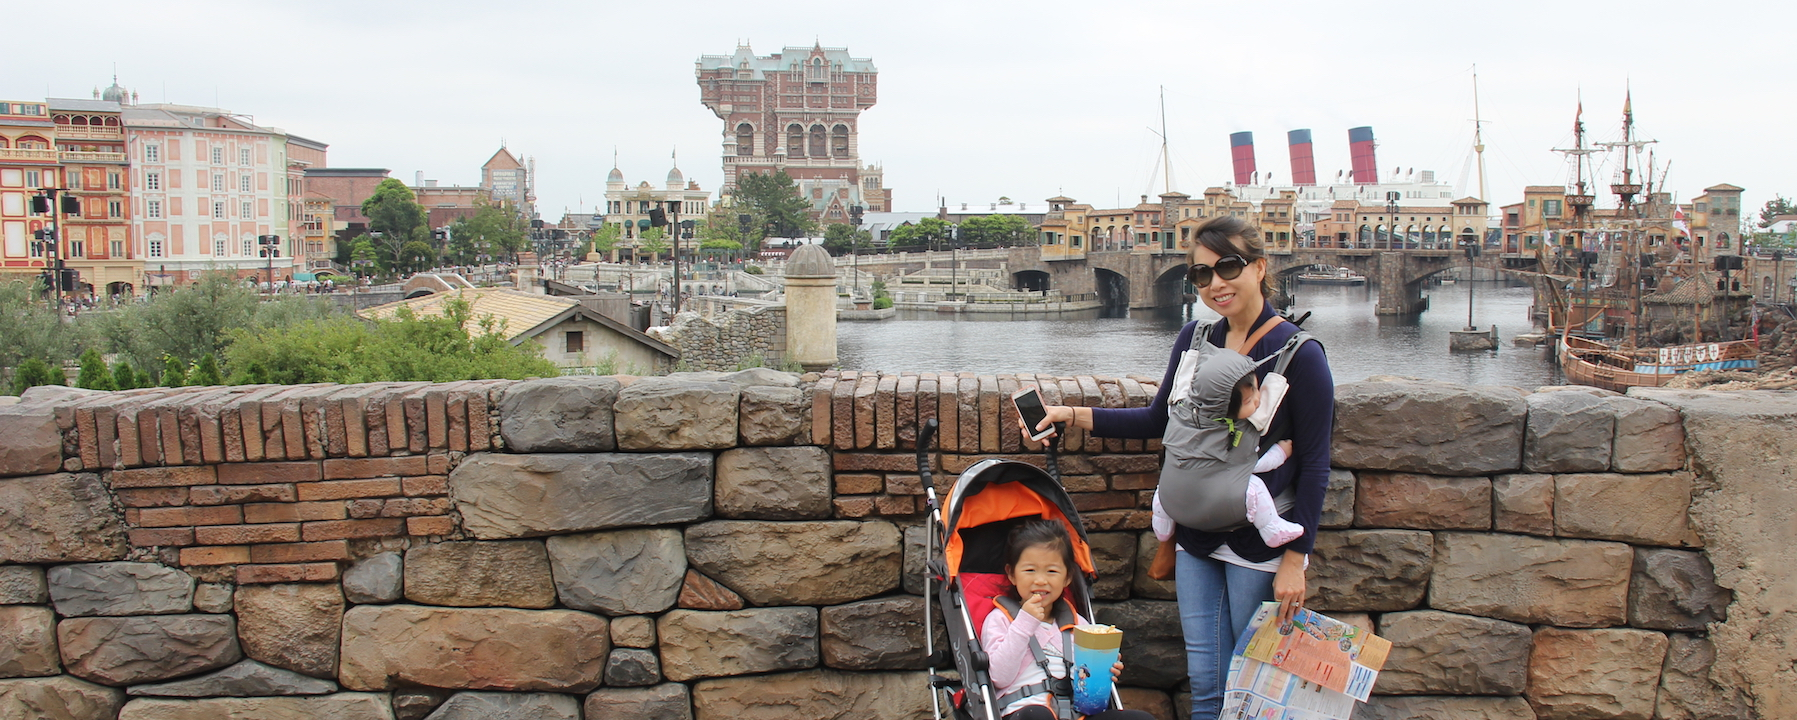 Header image at Tokyo Disneyland